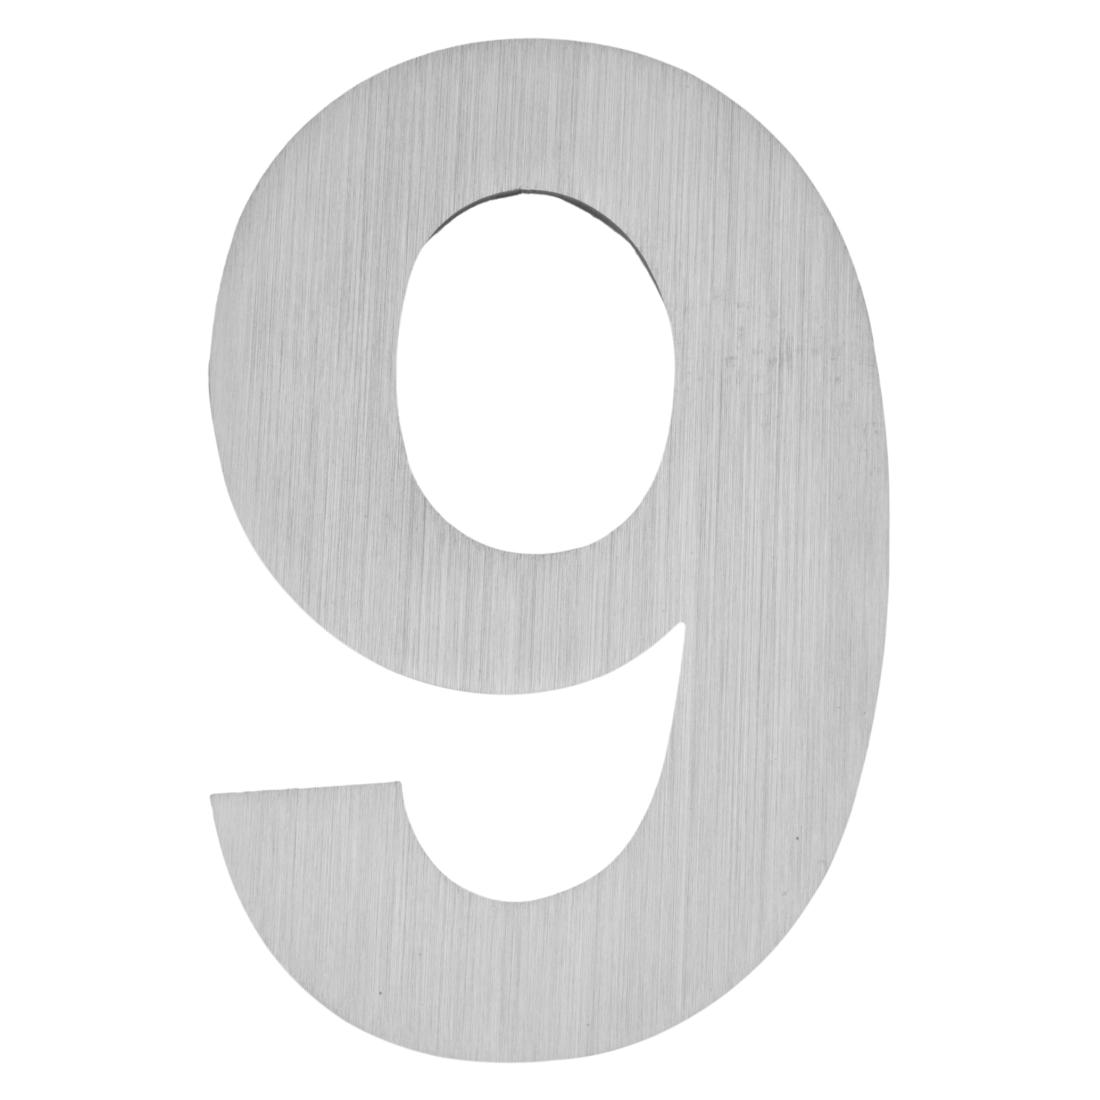 hausnummer zum aufschrauben 9 matt geb rstet edelstahl matt geb rstet silber moebel. Black Bedroom Furniture Sets. Home Design Ideas